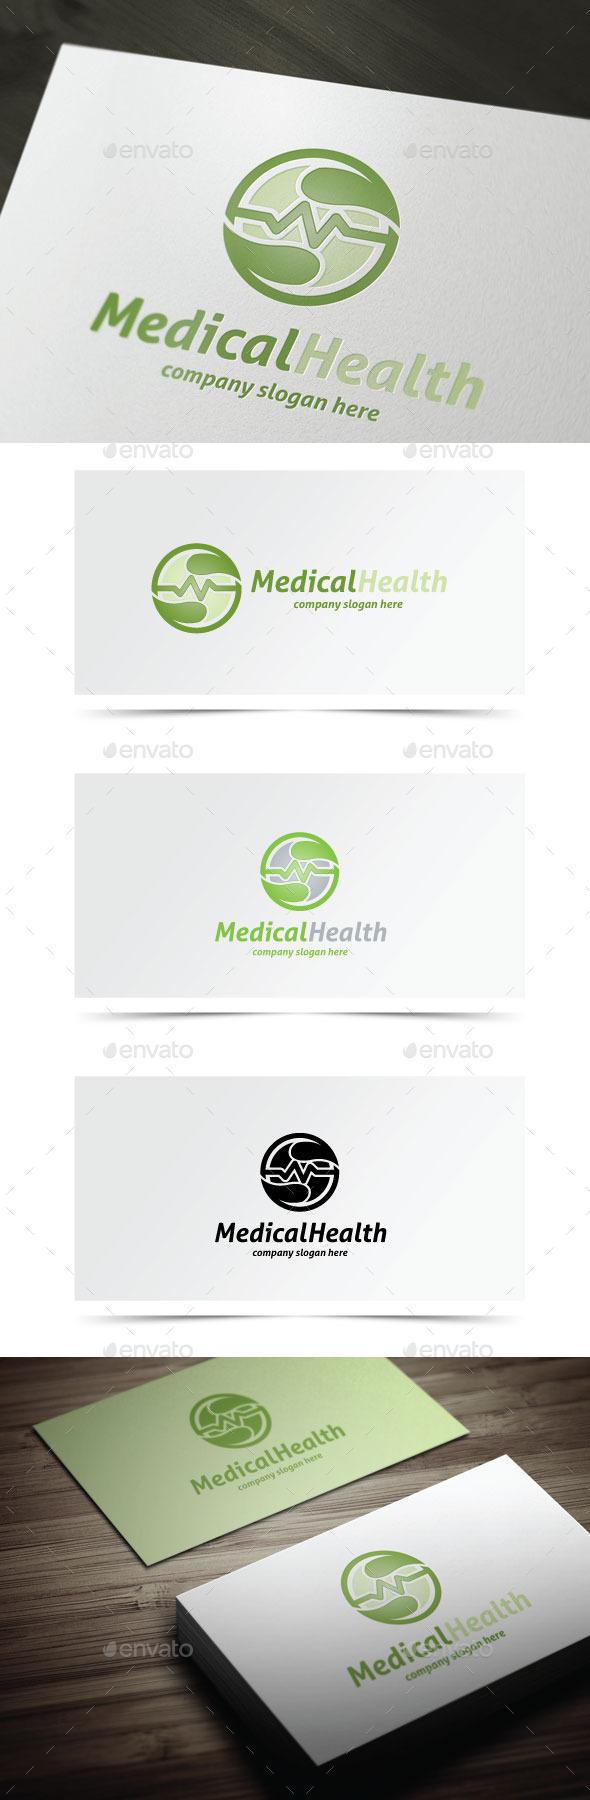 GraphicRiver Medical Health 10490931